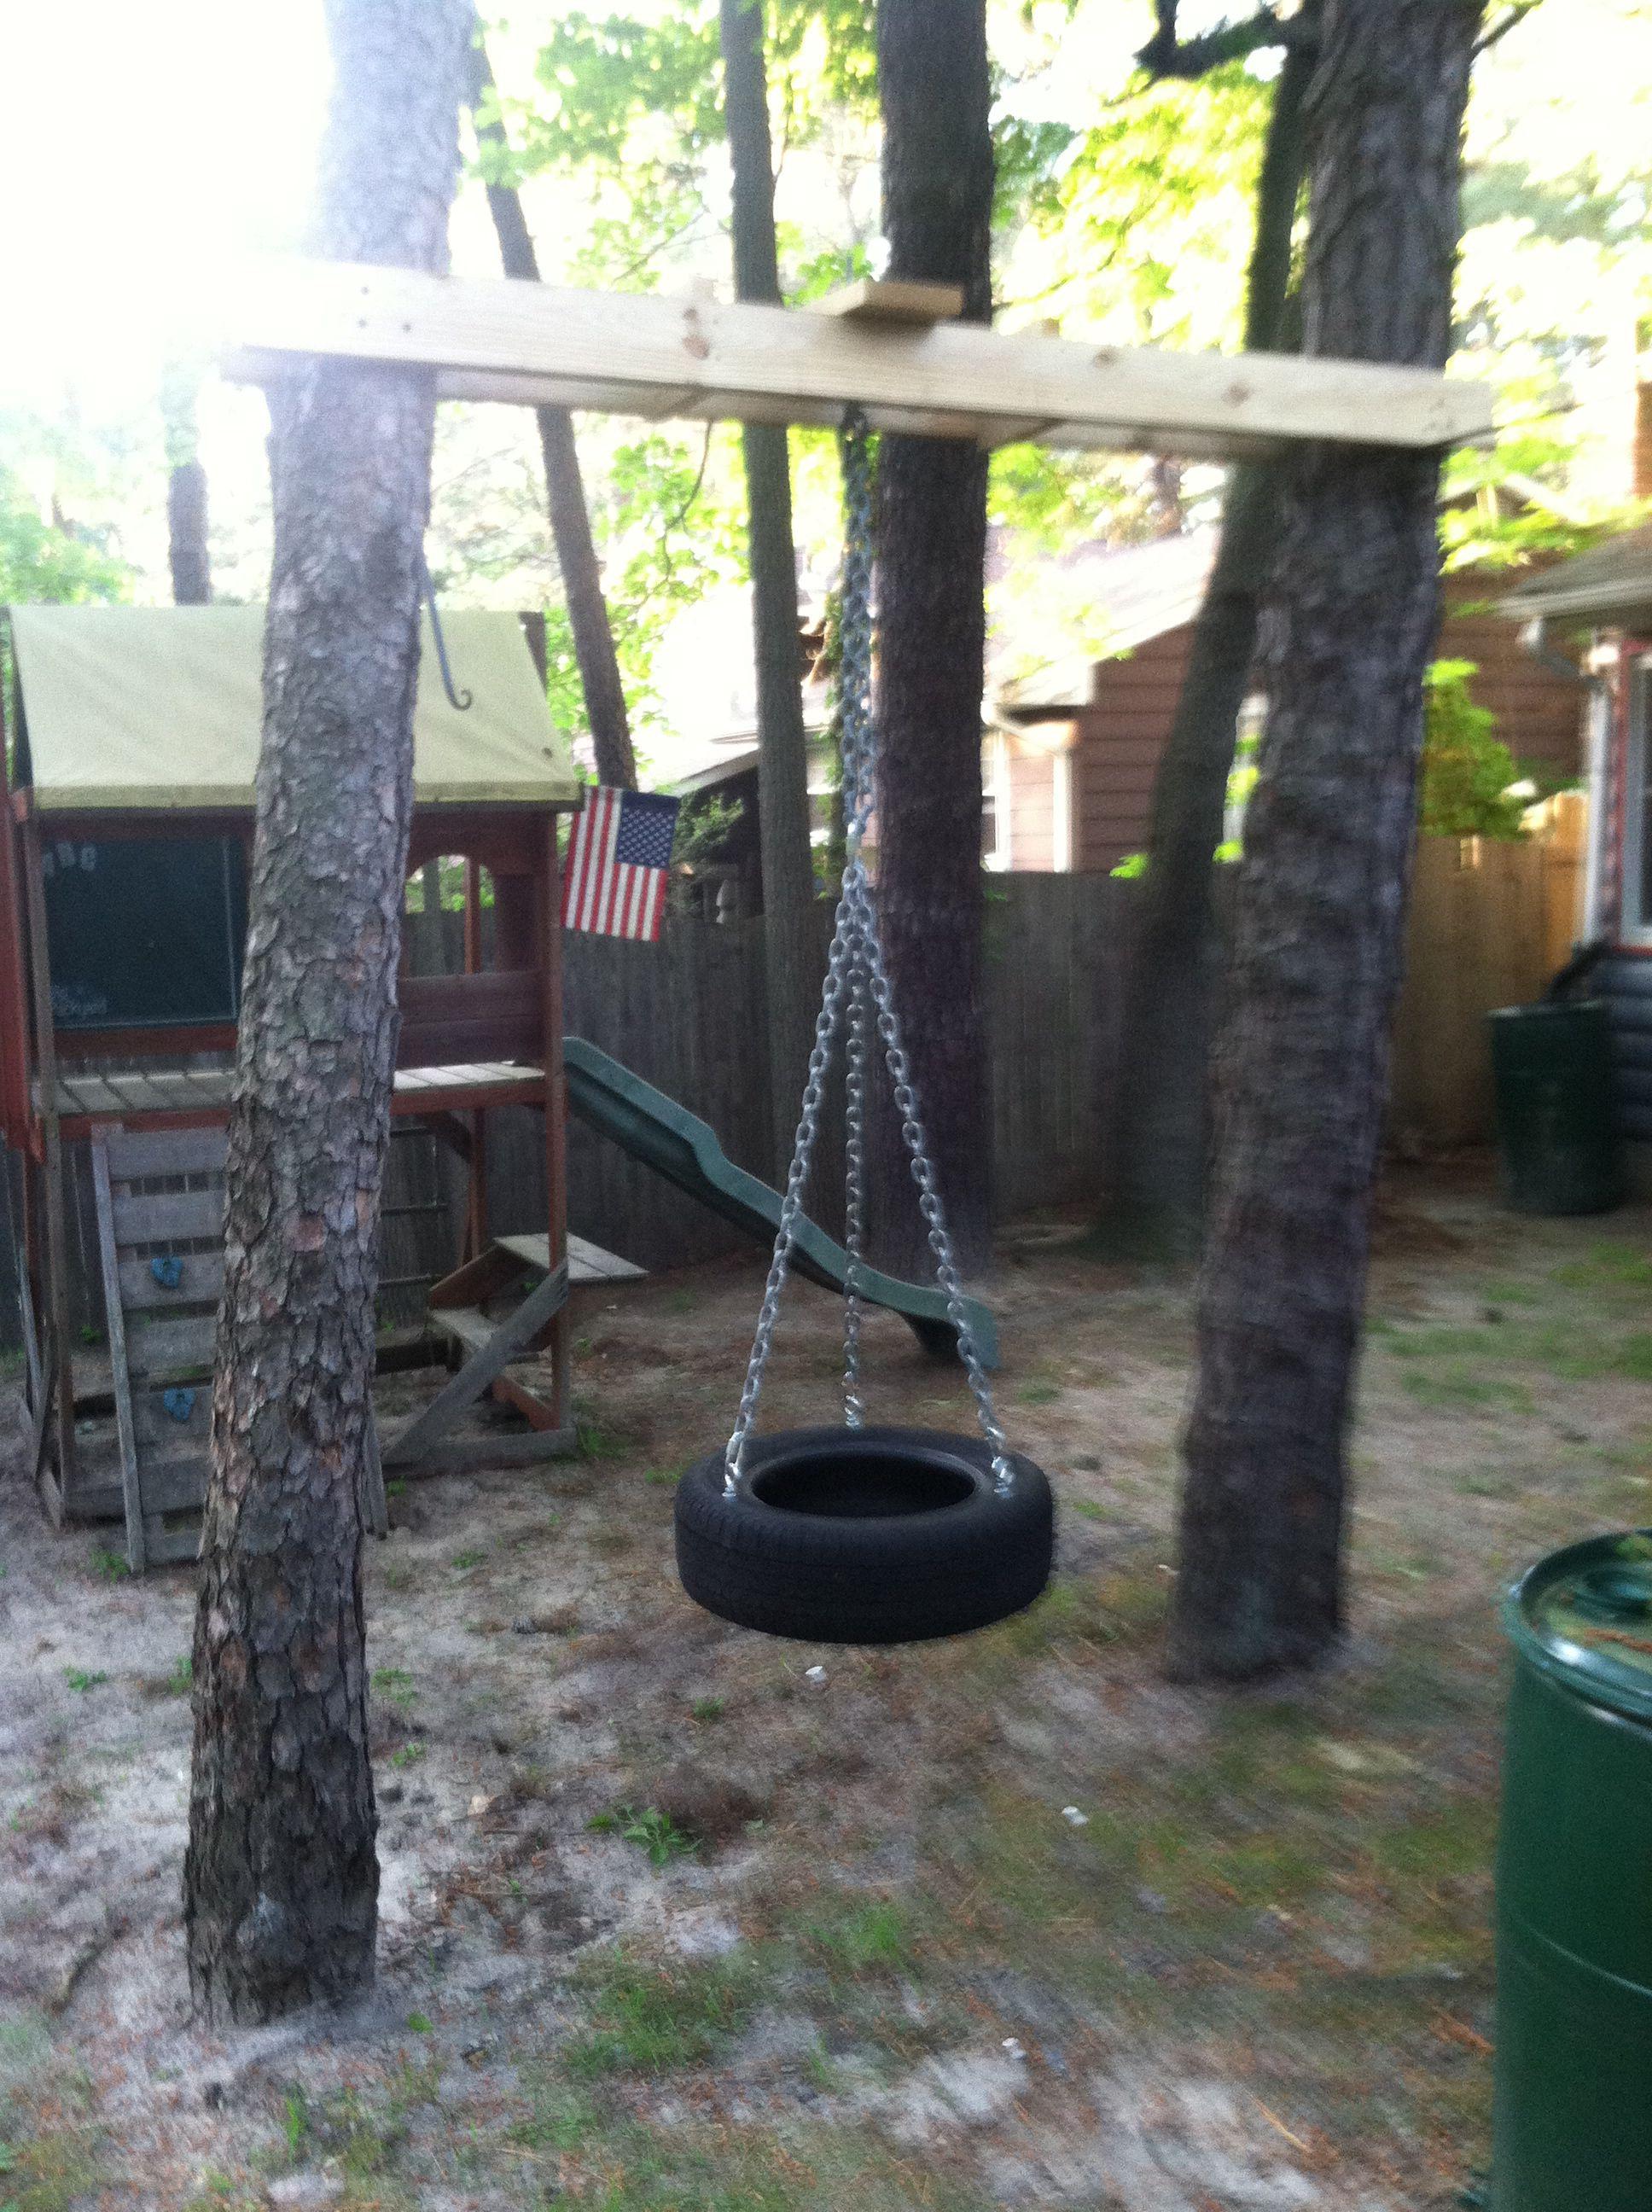 tire swing between two trees backyard ideas pinterest swings yards and backyard. Black Bedroom Furniture Sets. Home Design Ideas